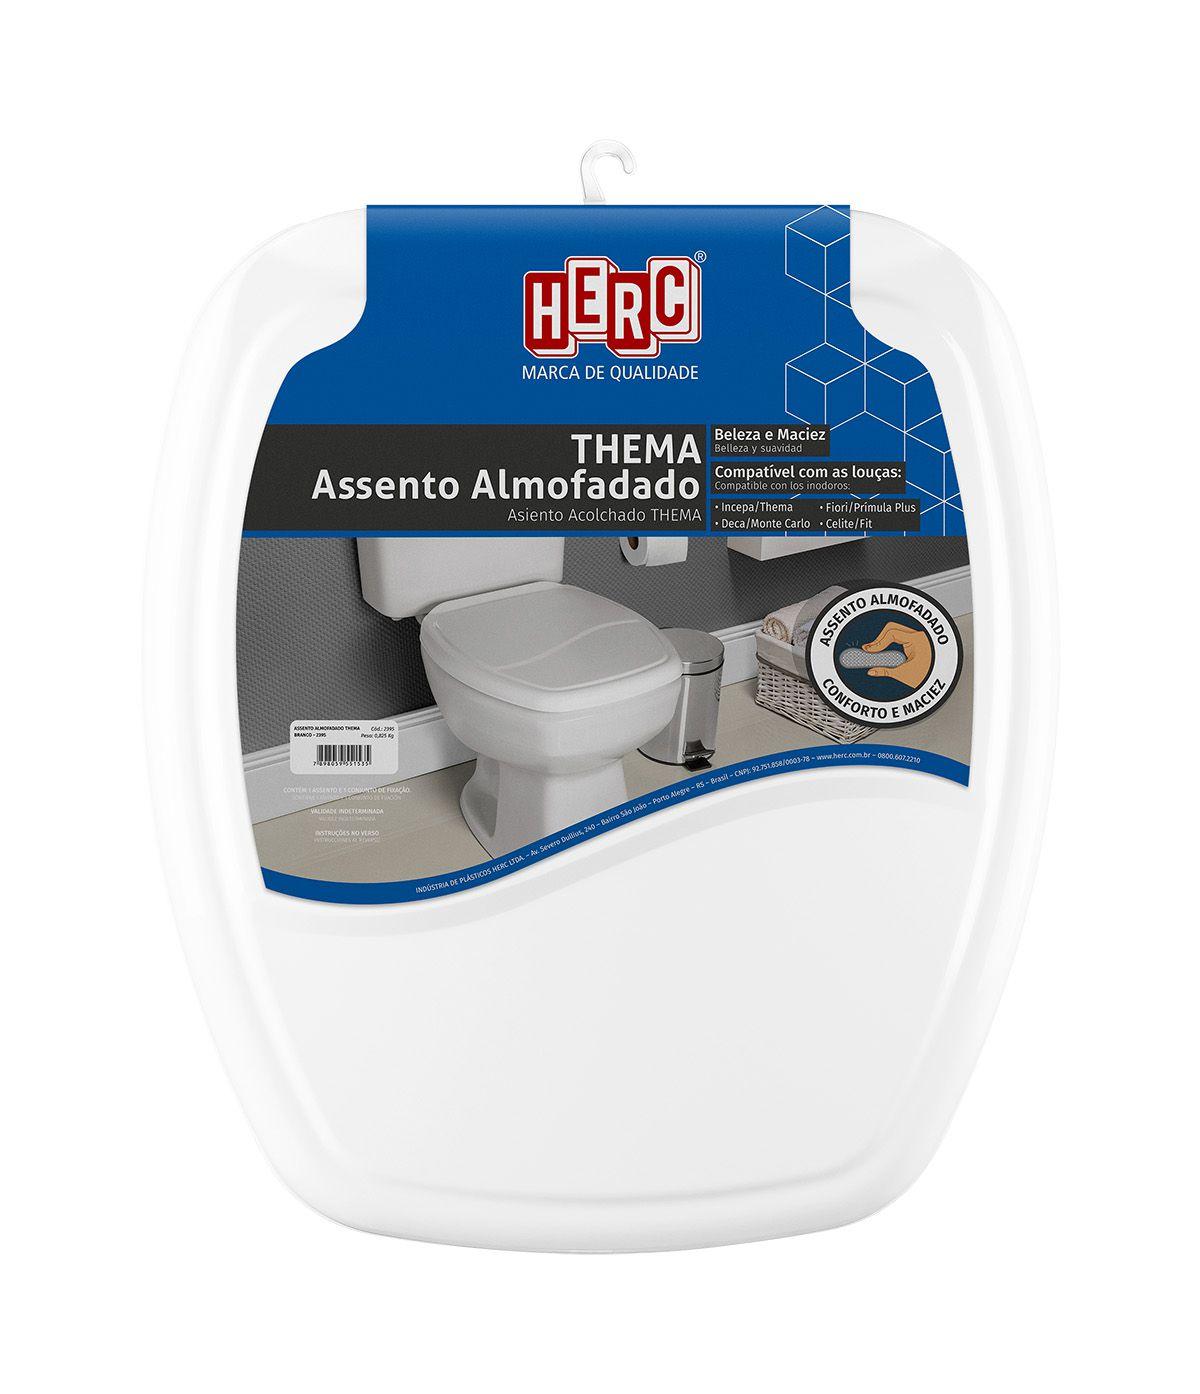 Tampa de Vaso / Assento Sanitário Branco Almofadado Thema 2395 Herc